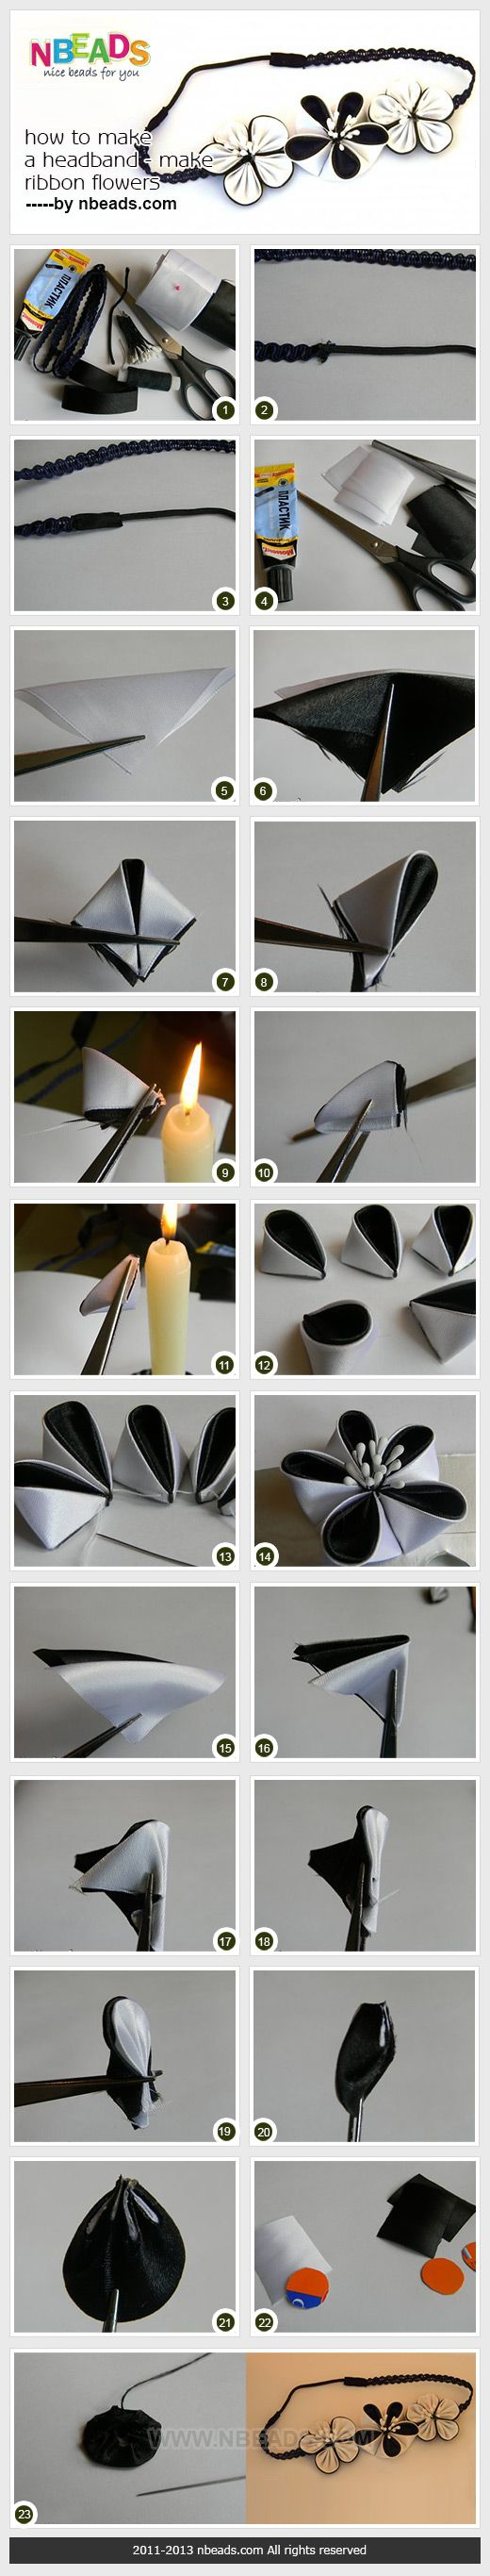 how to make a headband - make ribbon flowers